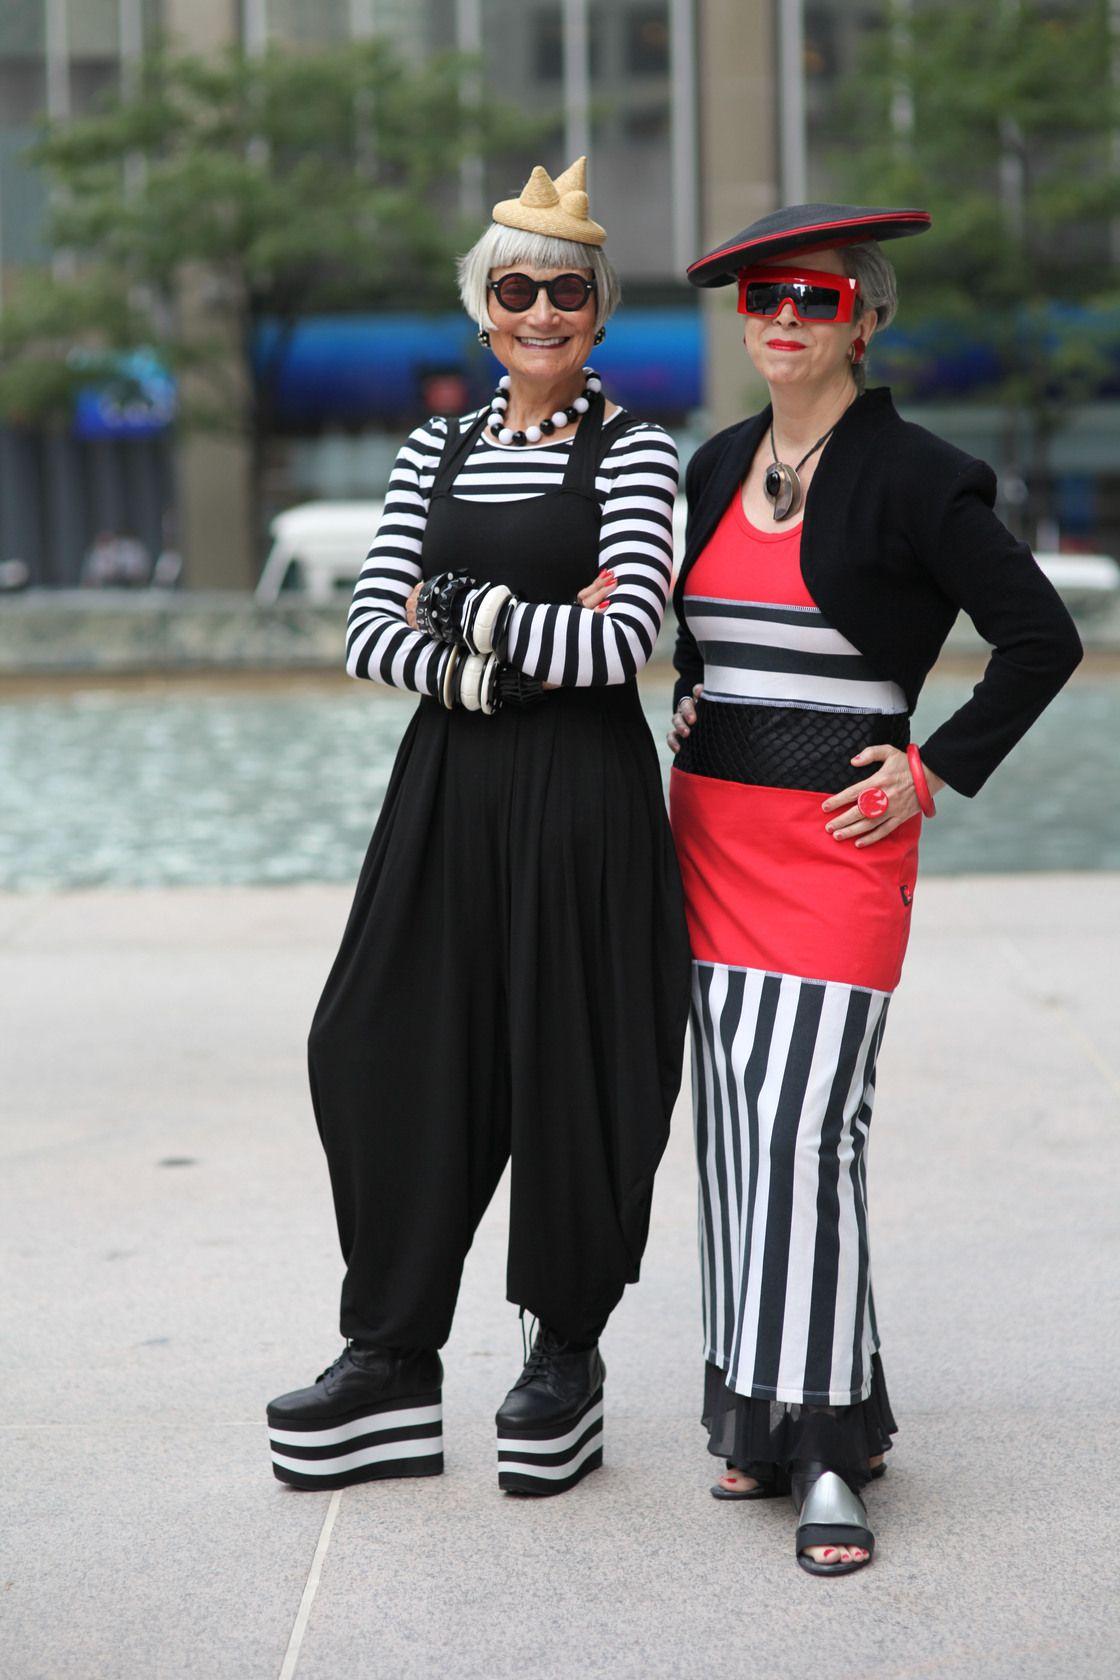 Fabulous outrageously fashion new photo